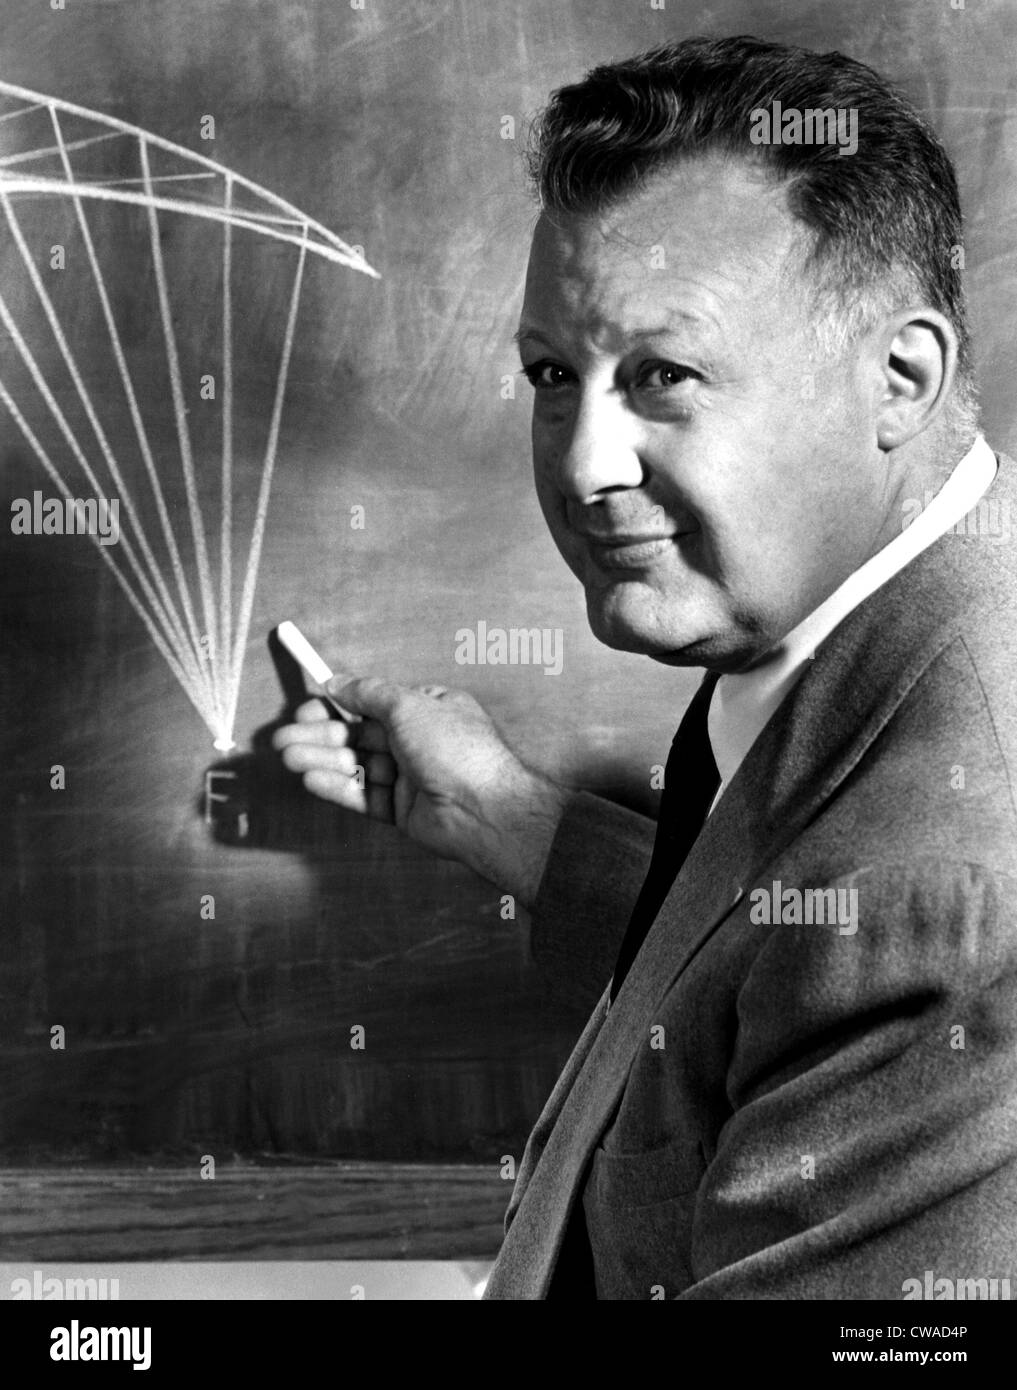 CLIFTON FADIMAN, 10/25/57. Courtesy: CSU Archives / Everett Collection - Stock Image